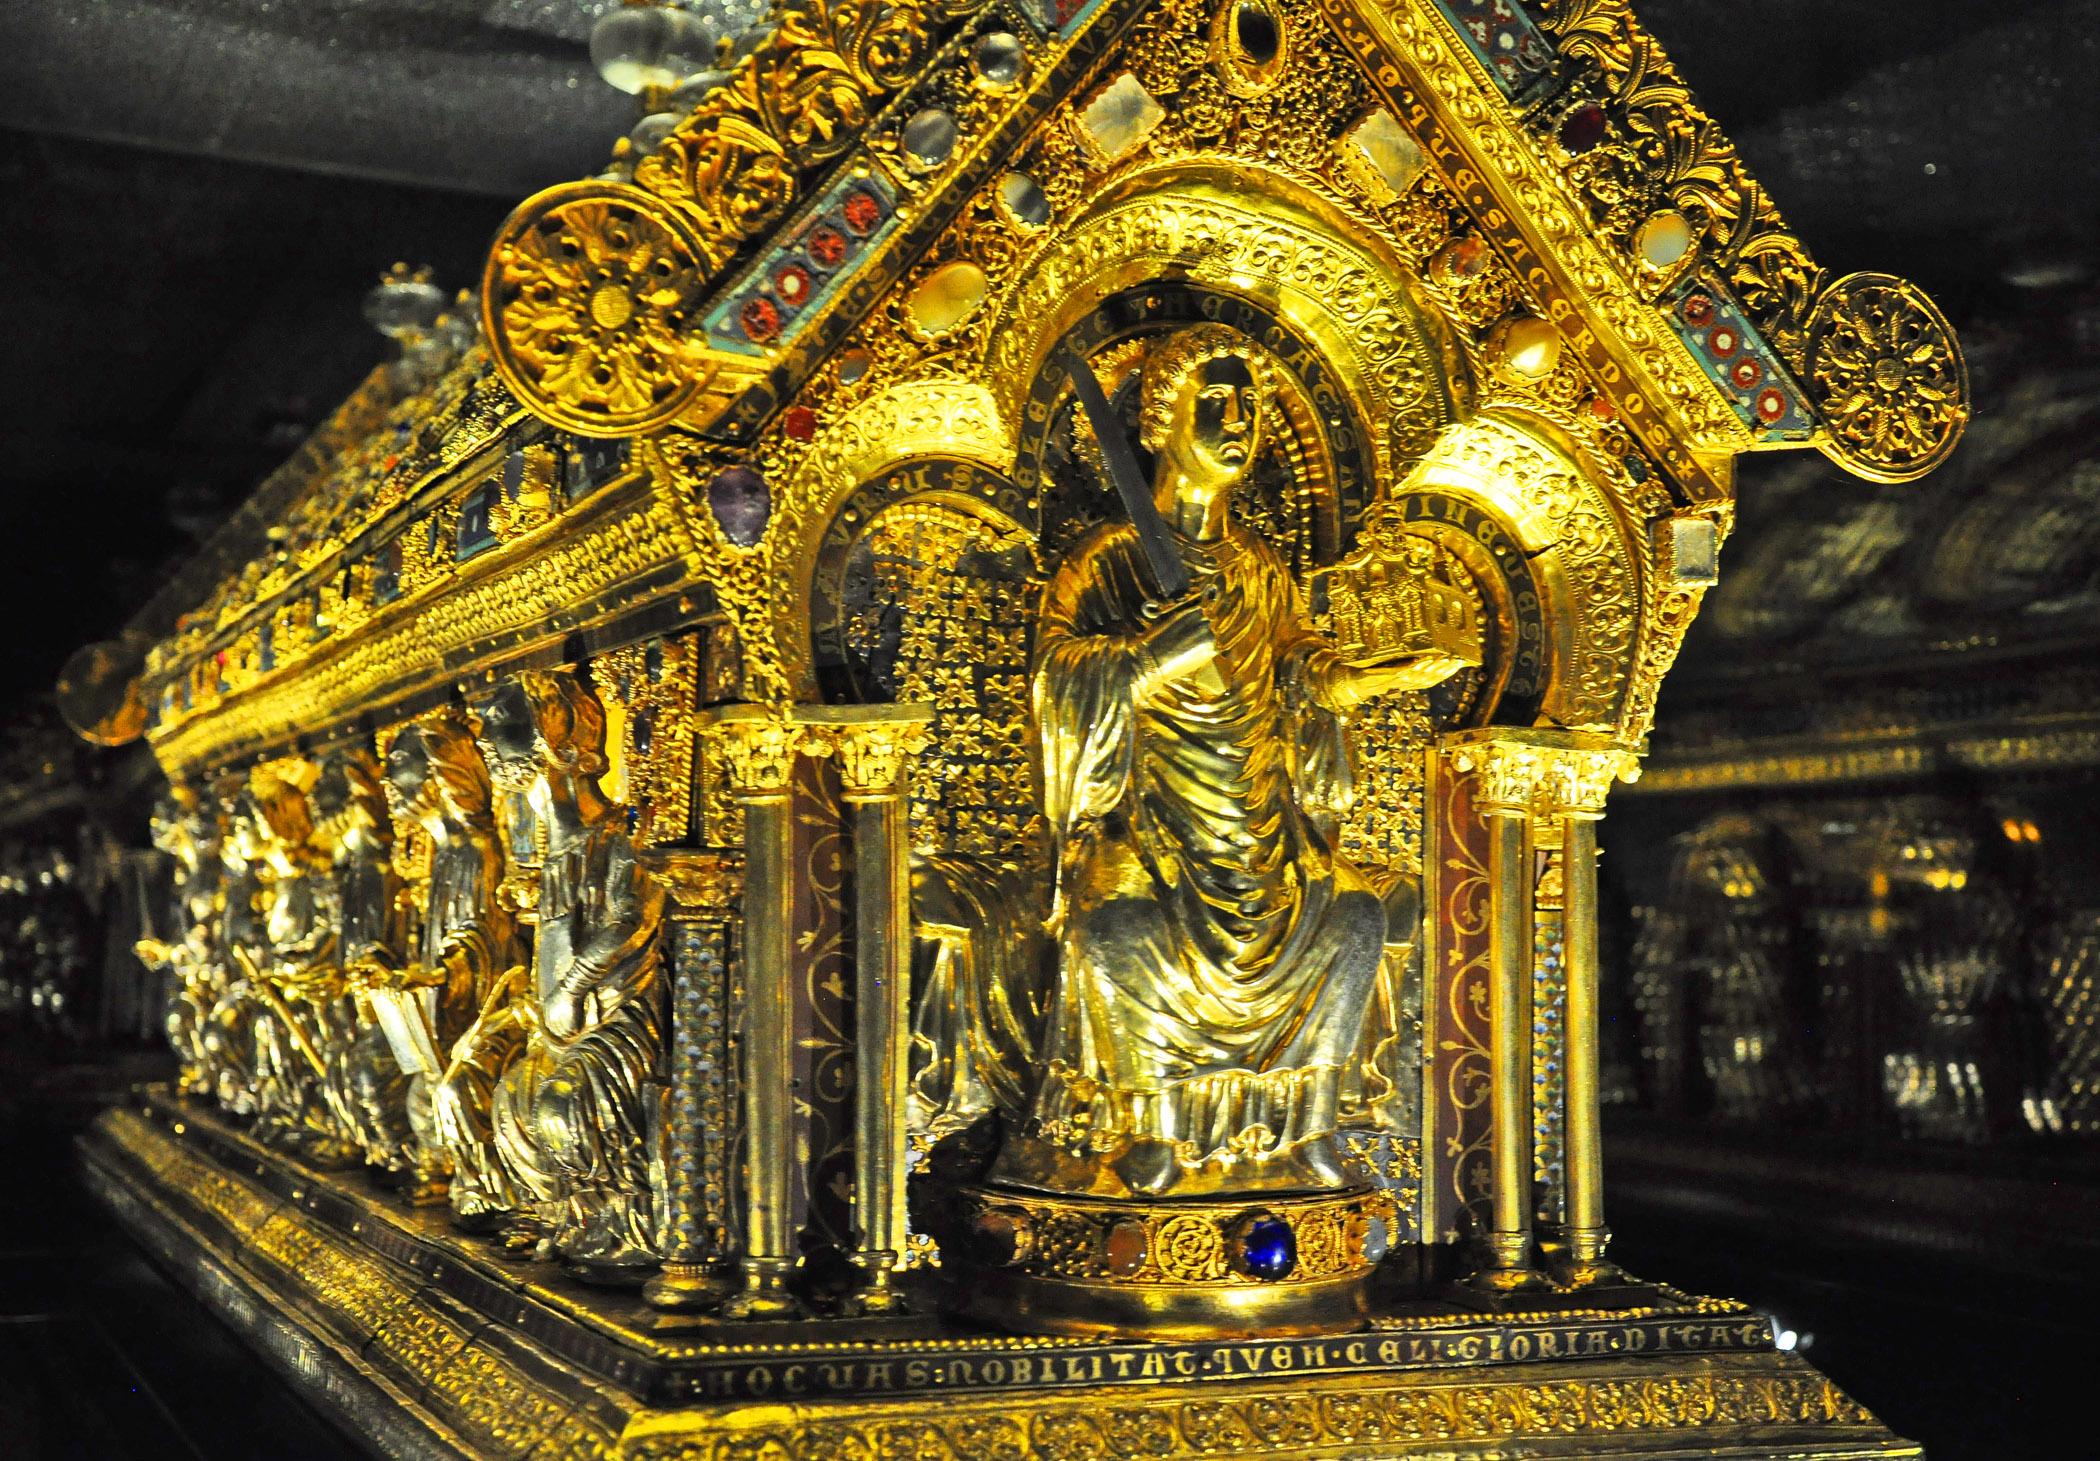 4. Reliquary of St Maurus